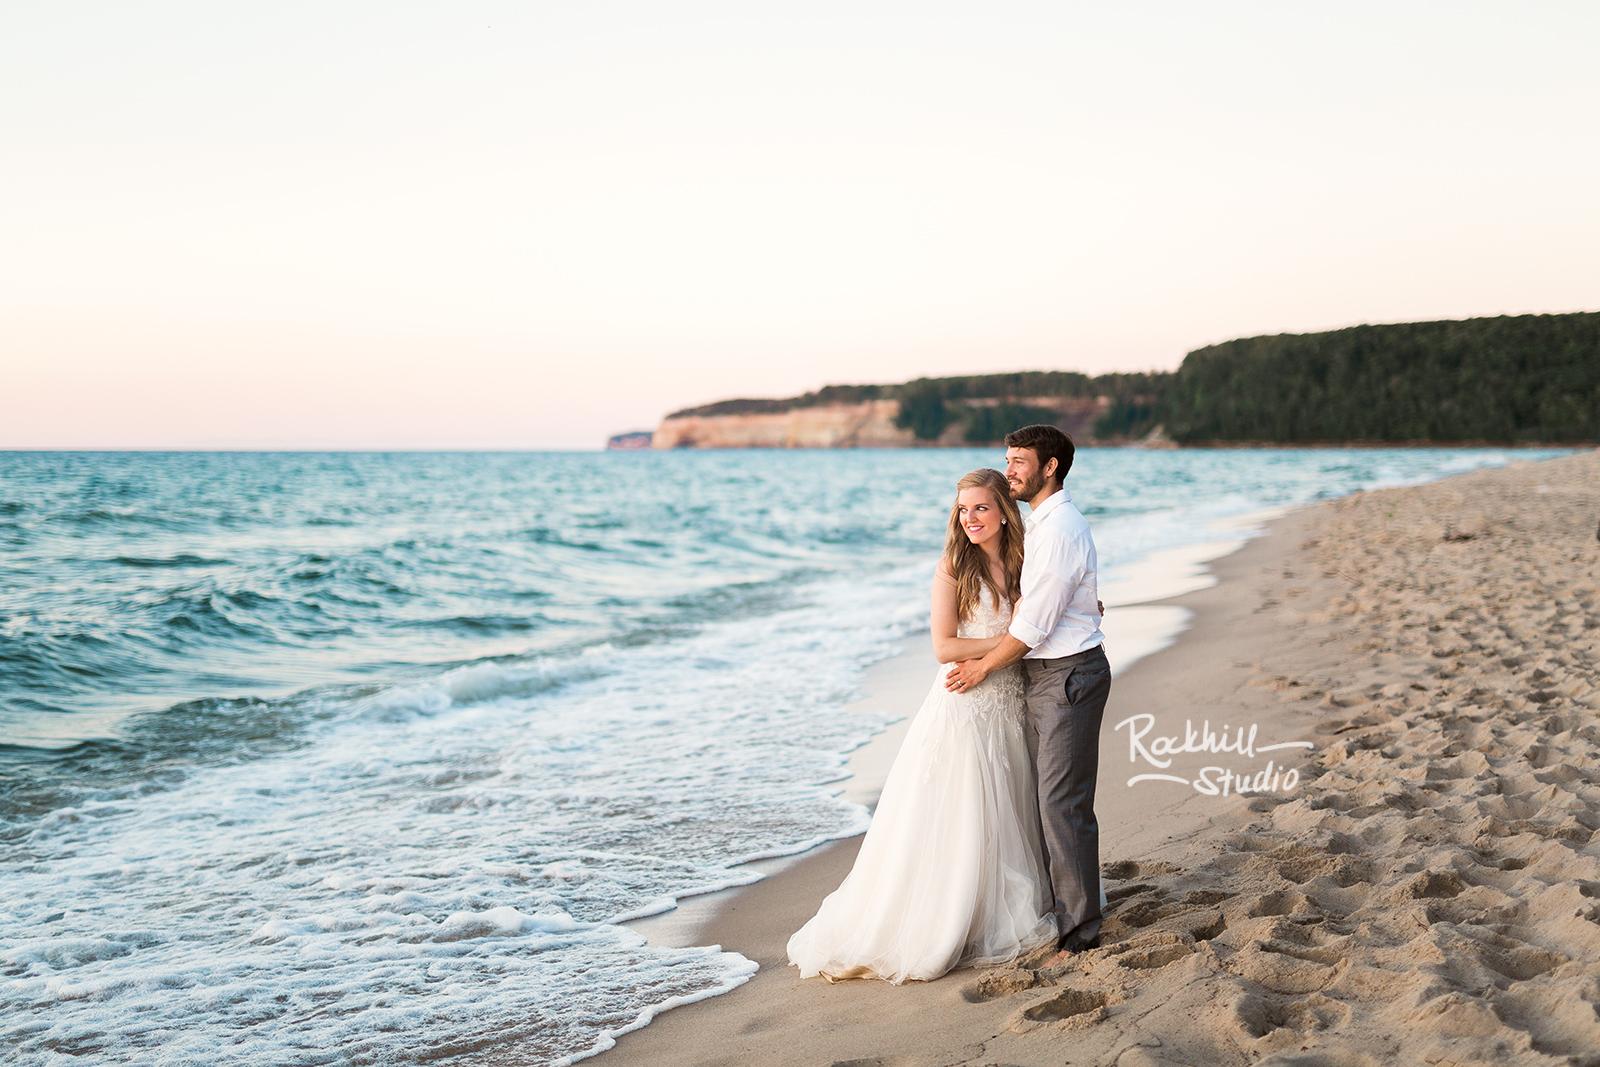 traverse city wedding photographer rockhill studio beach wedding